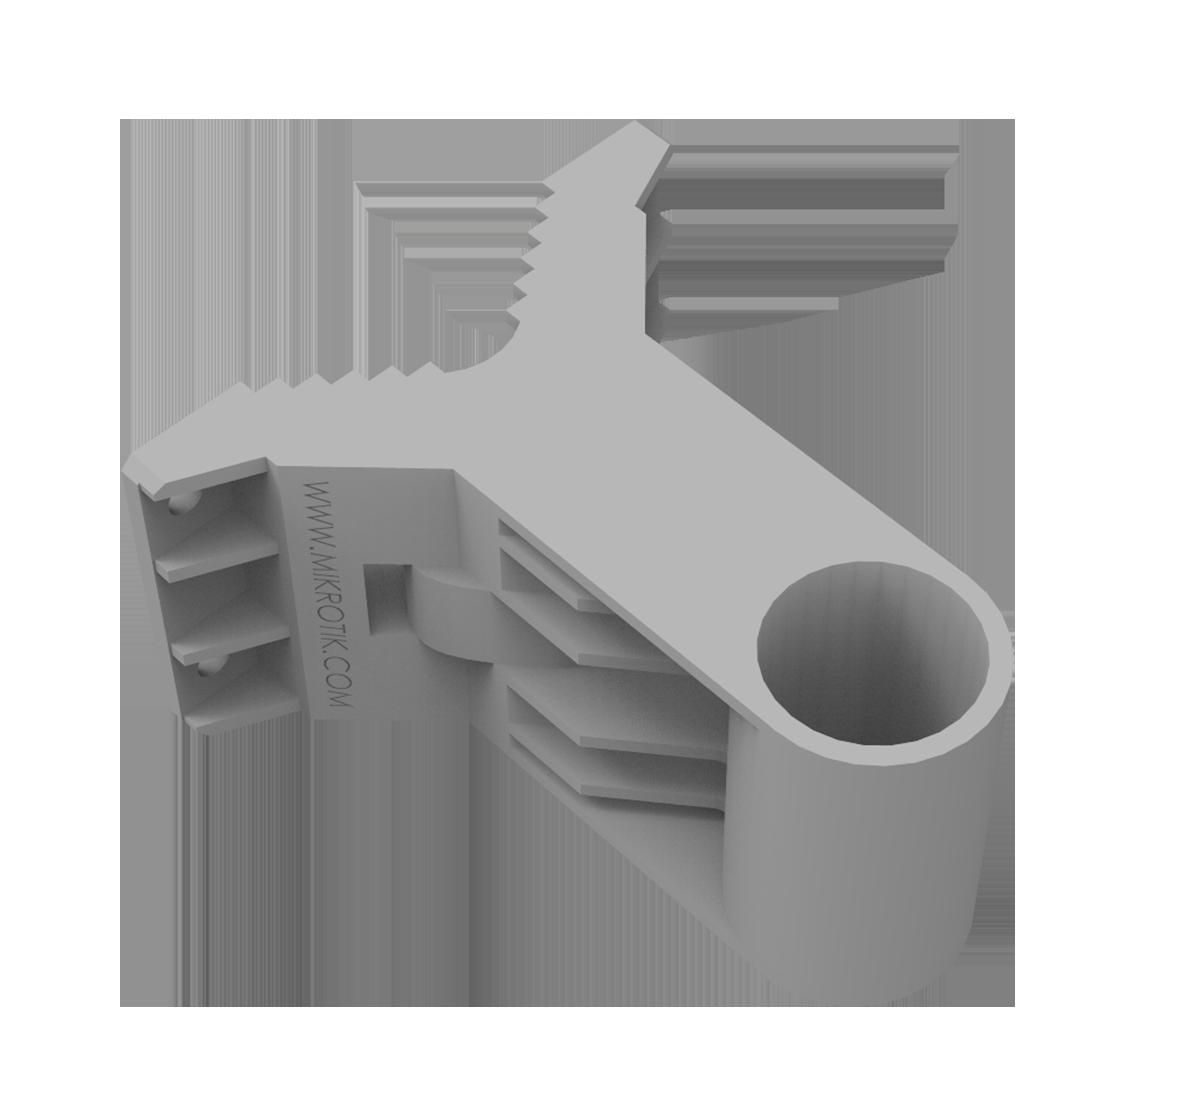 Small Wall Mount : Mikrotik quickMOUNT QM small wall mount adapter - New! :: Mikrotik ...